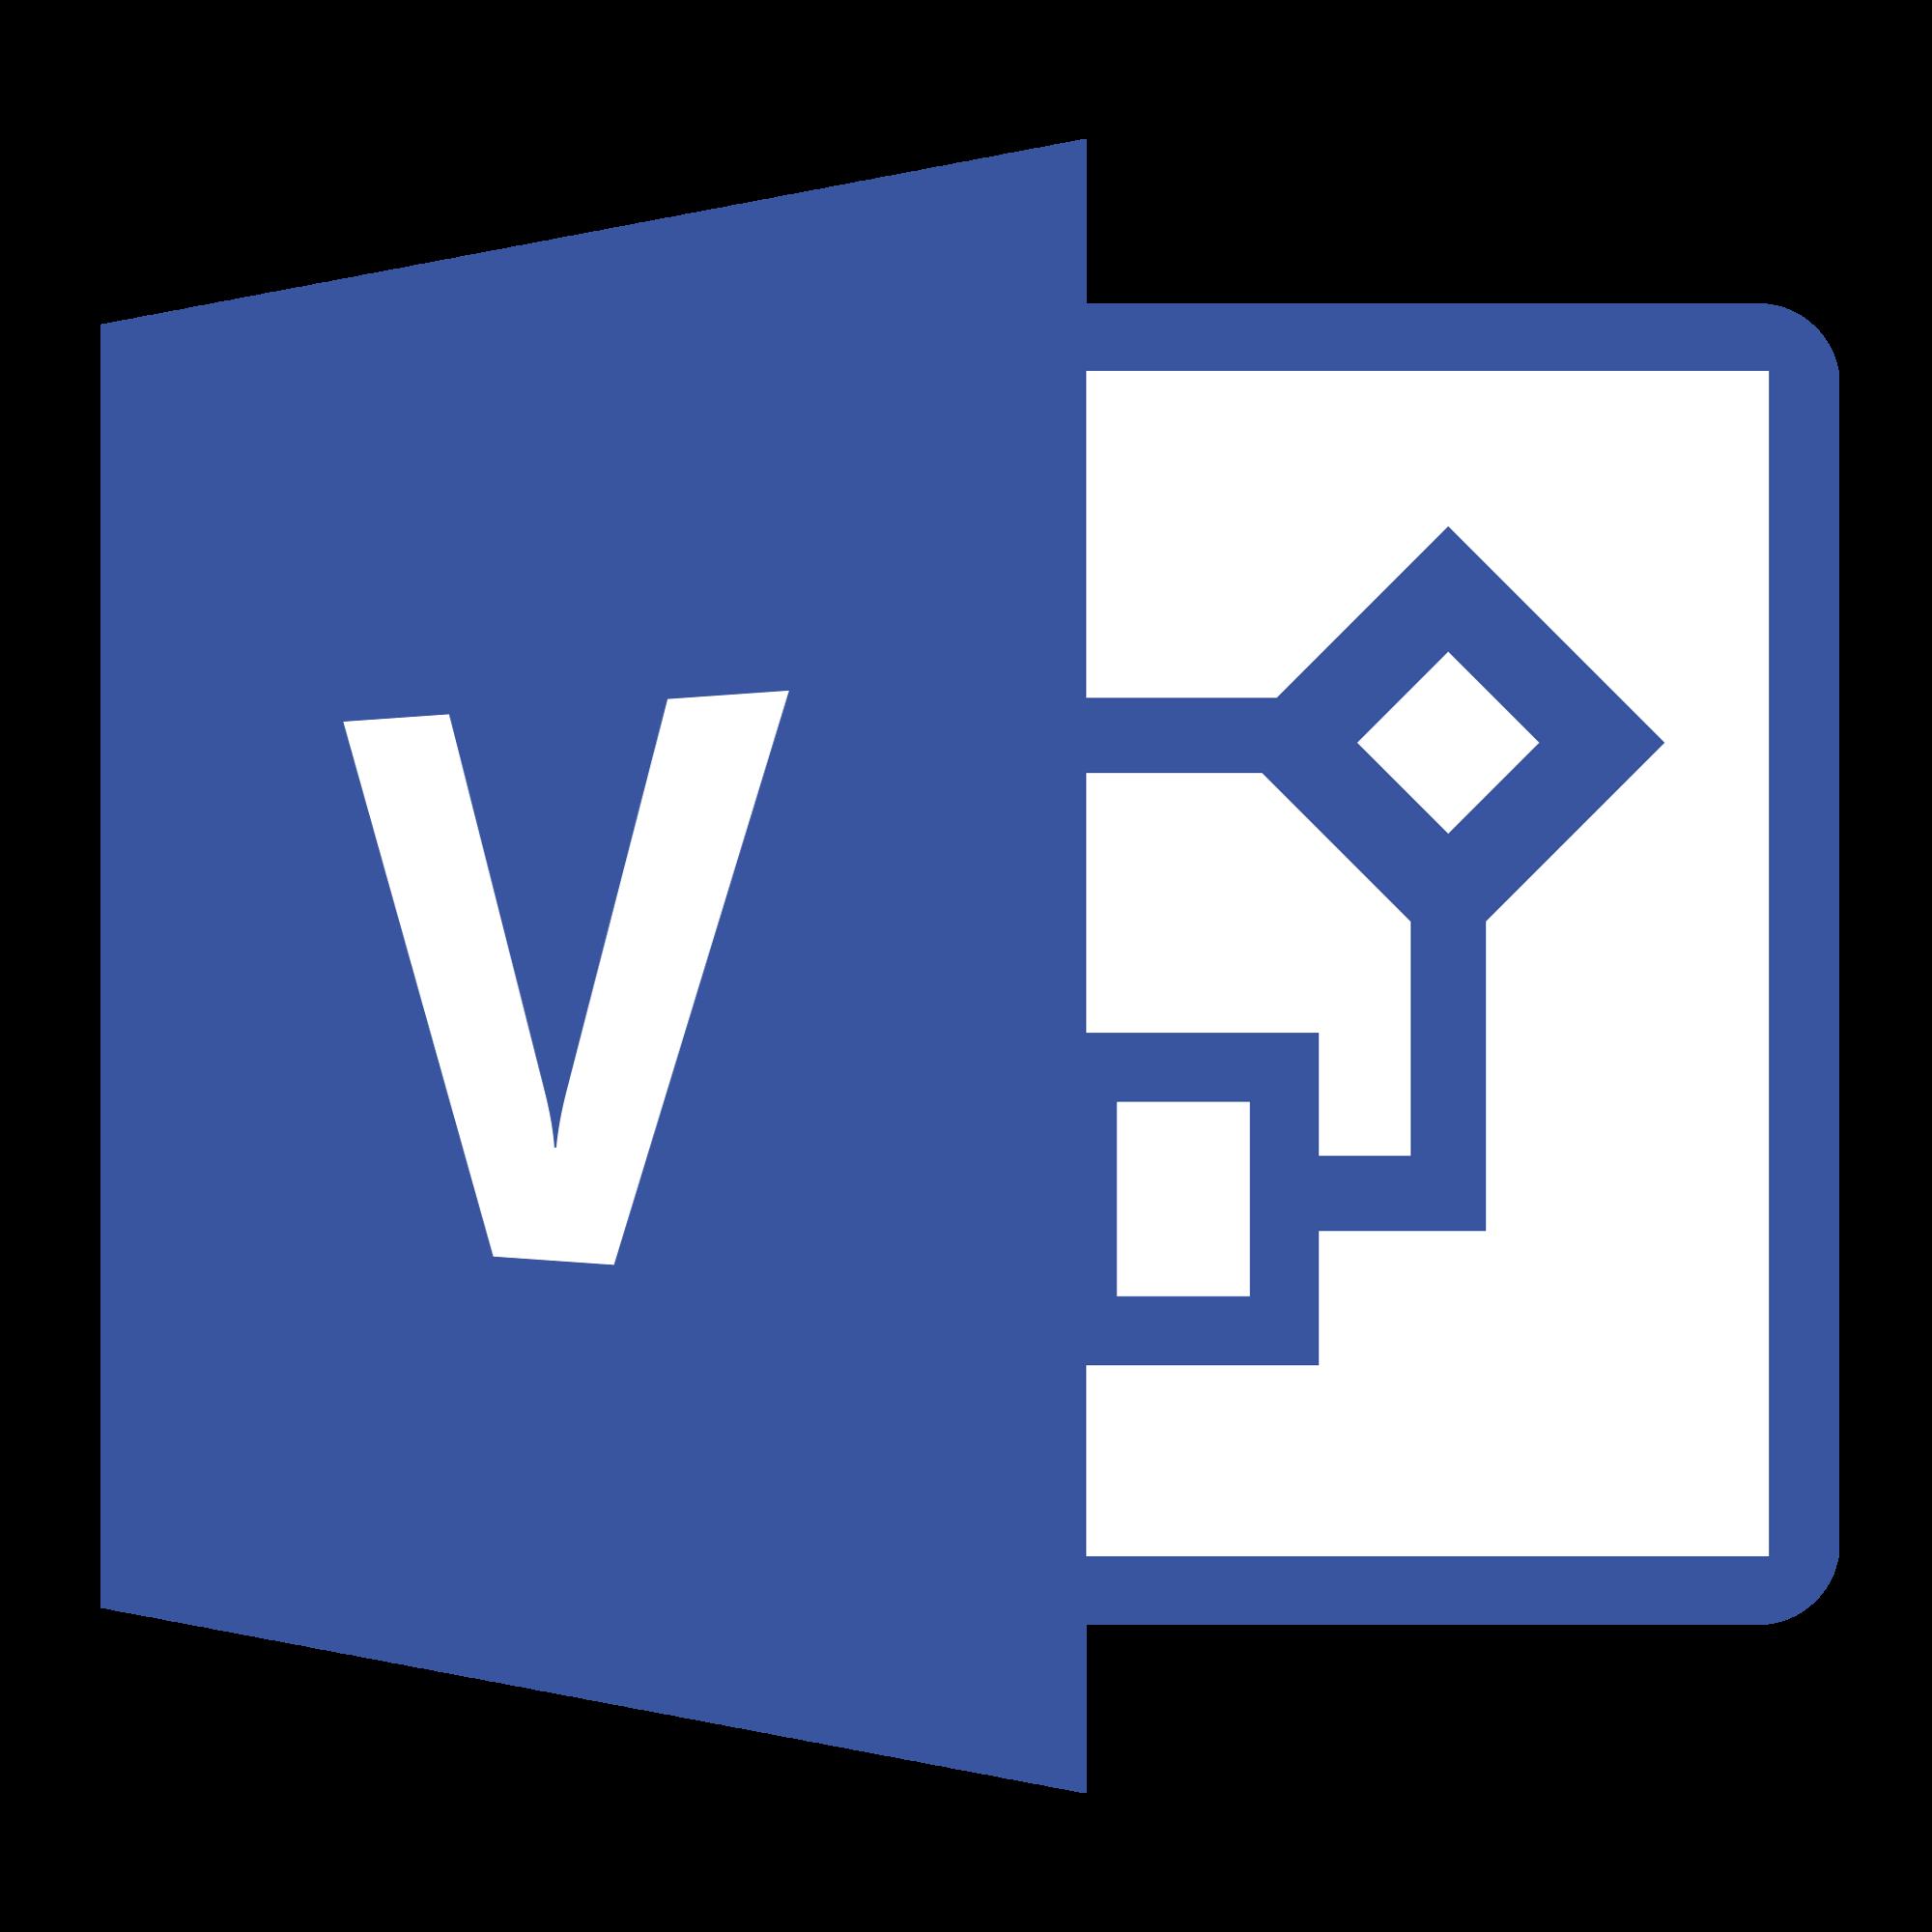 Microsoft viso pro 2016